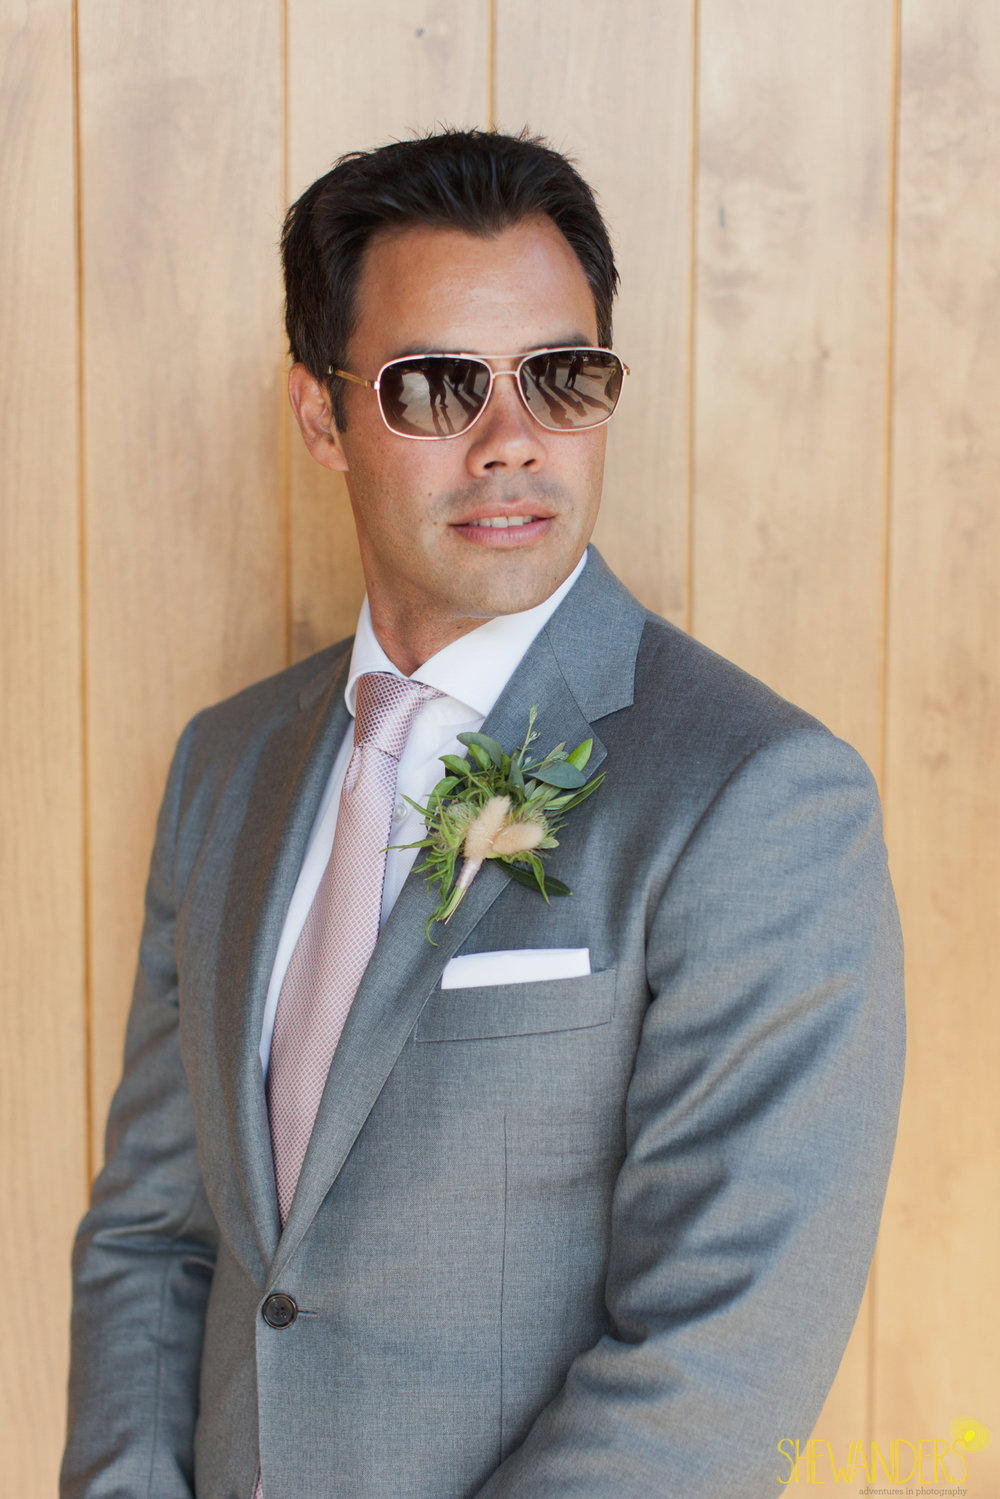 1014.Shewanders.TammiWalter.Wedding.SanDiego_1014.jpg.TammiWalter.Wedding.SanDiego_1014.jpg